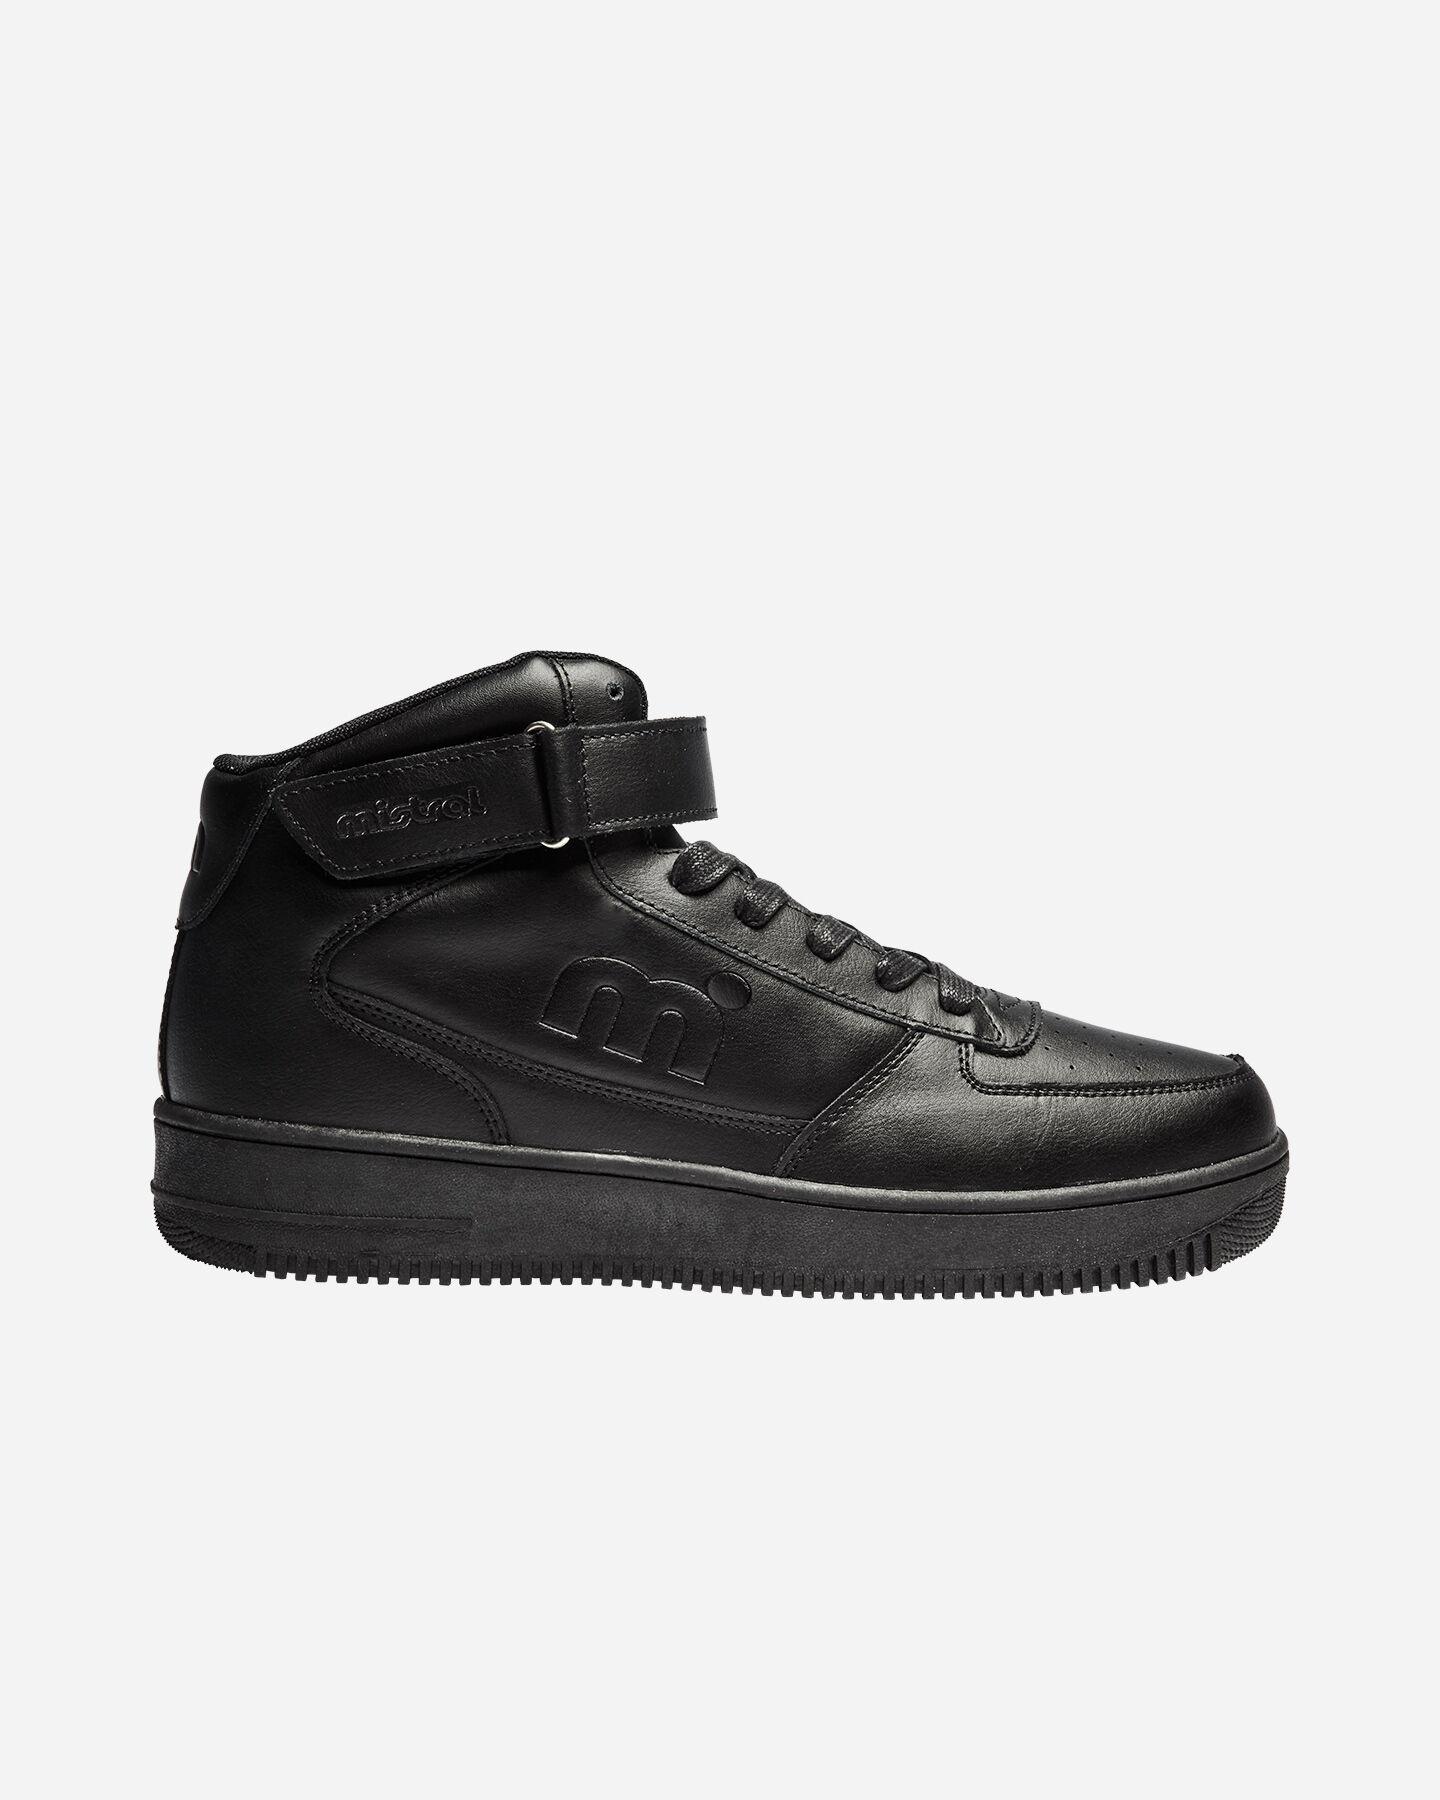 York New Scarpe Mistral Mistral Nike New Nike WDIYH9E2